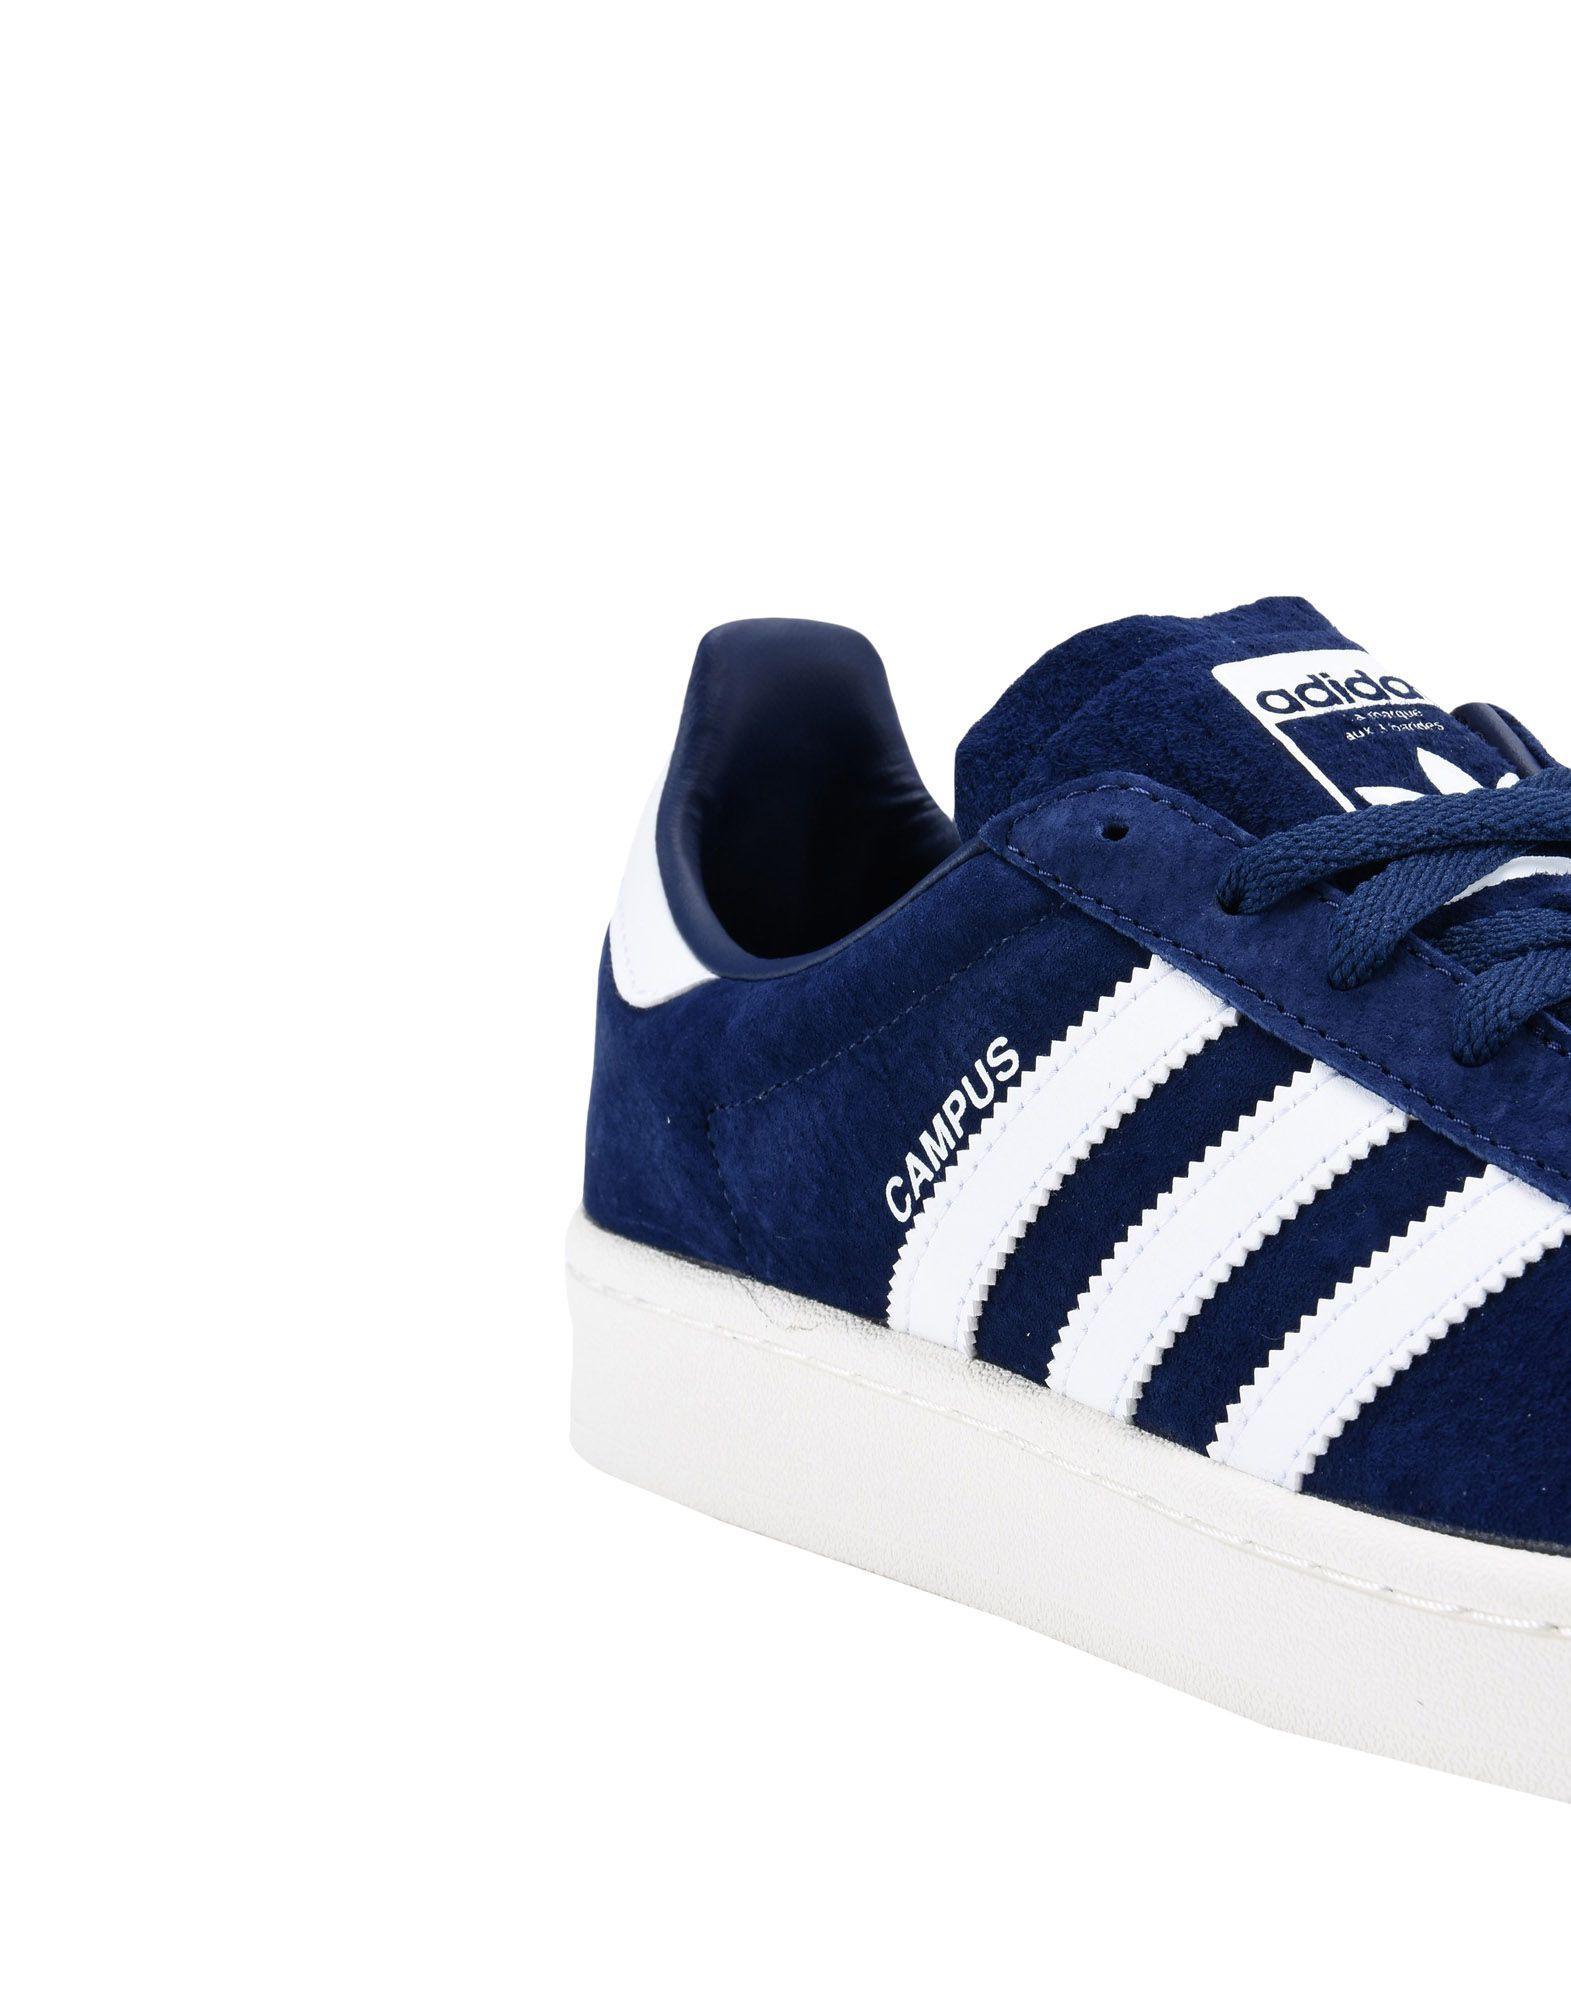 adidas Originals Suede Low-tops & Sneakers in Dark Blue (Blue)